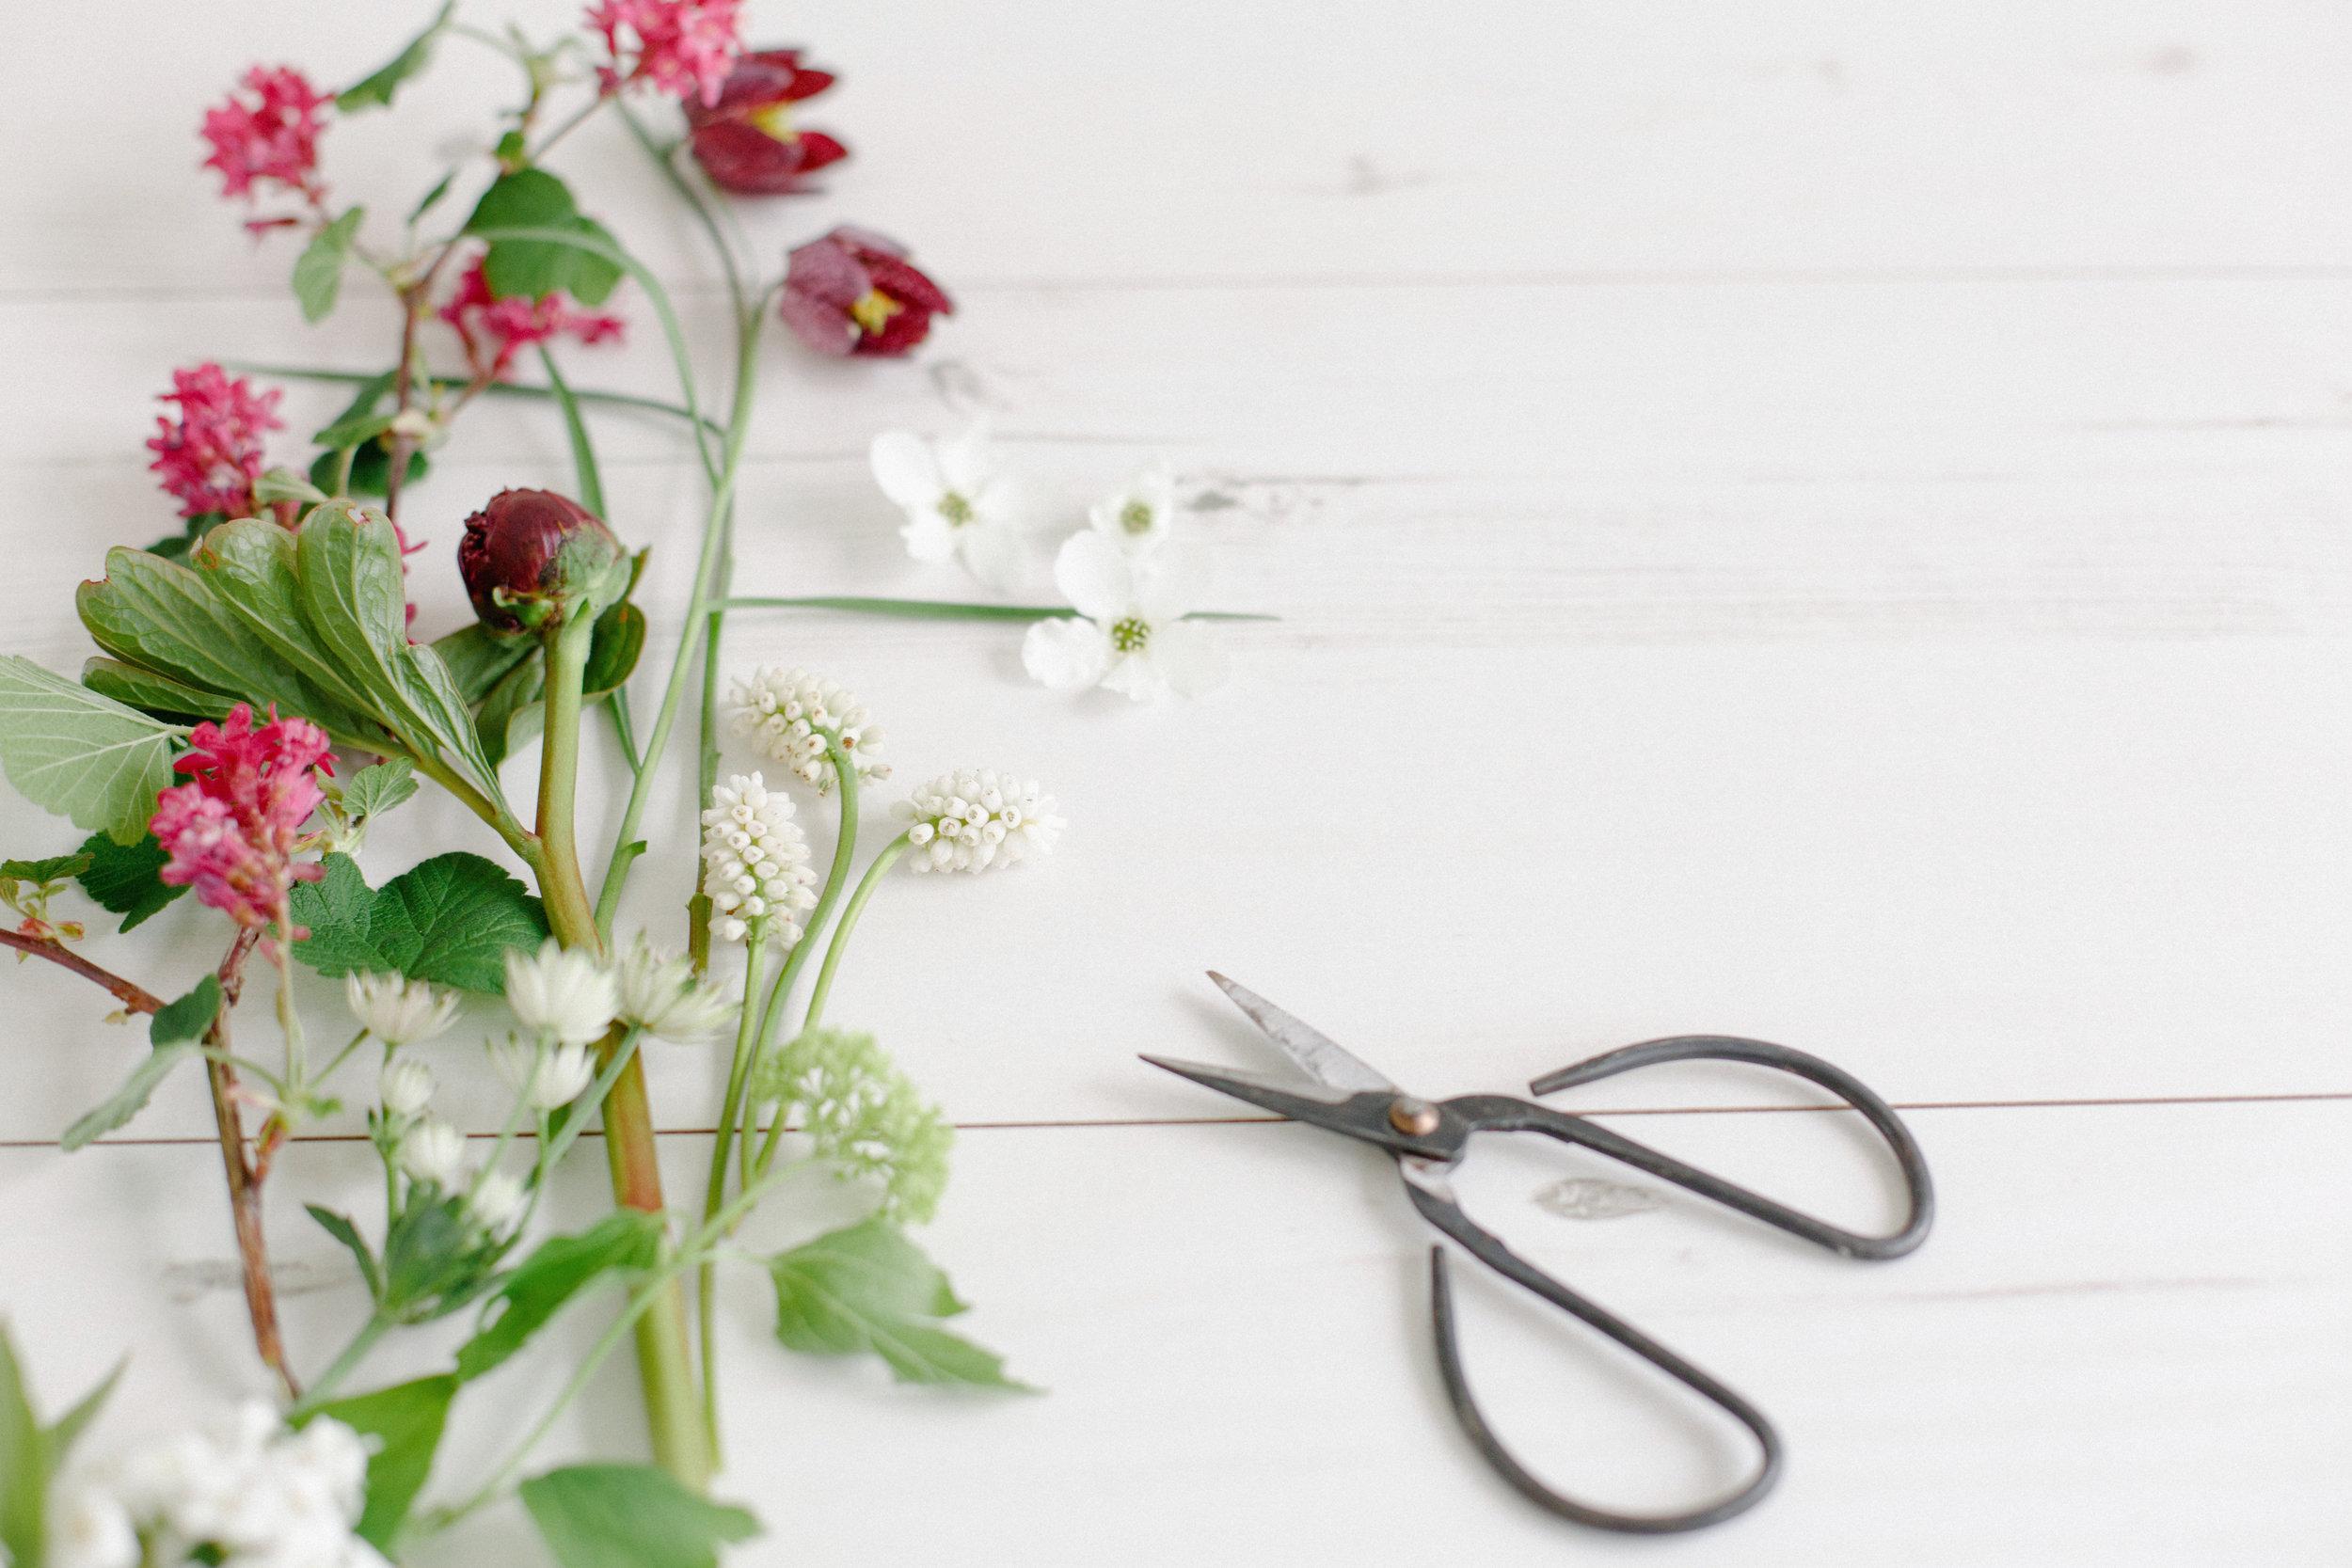 claire-graham-flower-photography-workshop-1.jpg